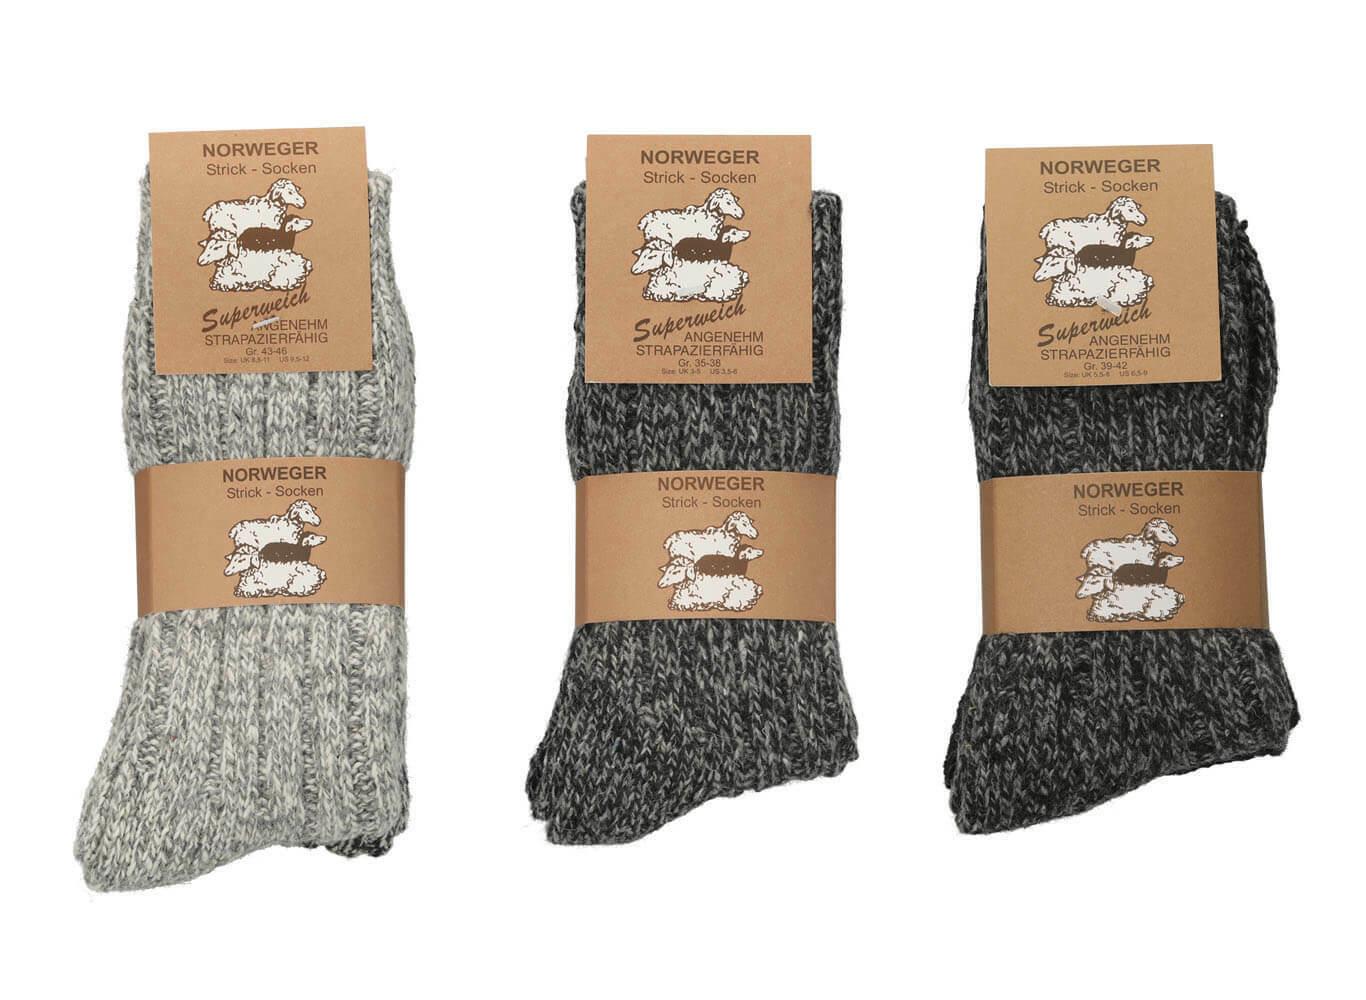 Norweger Socken grau Herren Damen 2 Paar gestrickte dicke warme Wintersocken